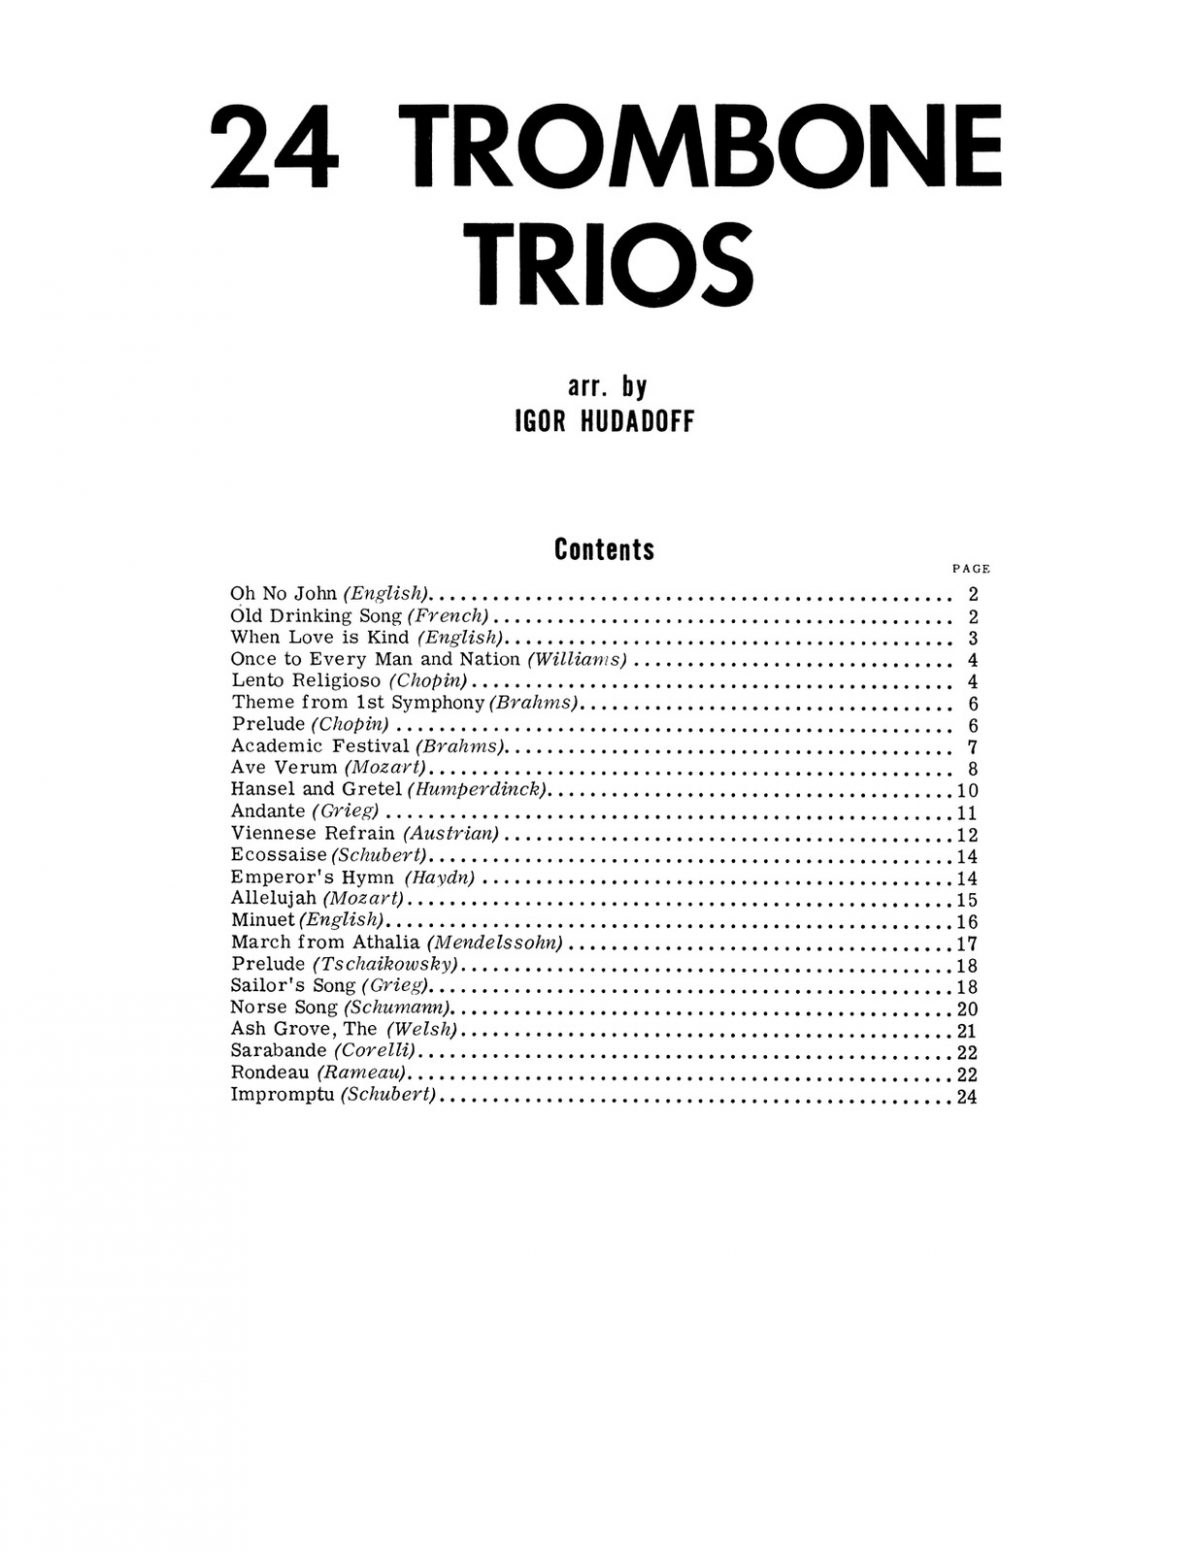 Hudadoff, 24 Trombone Trios-p03